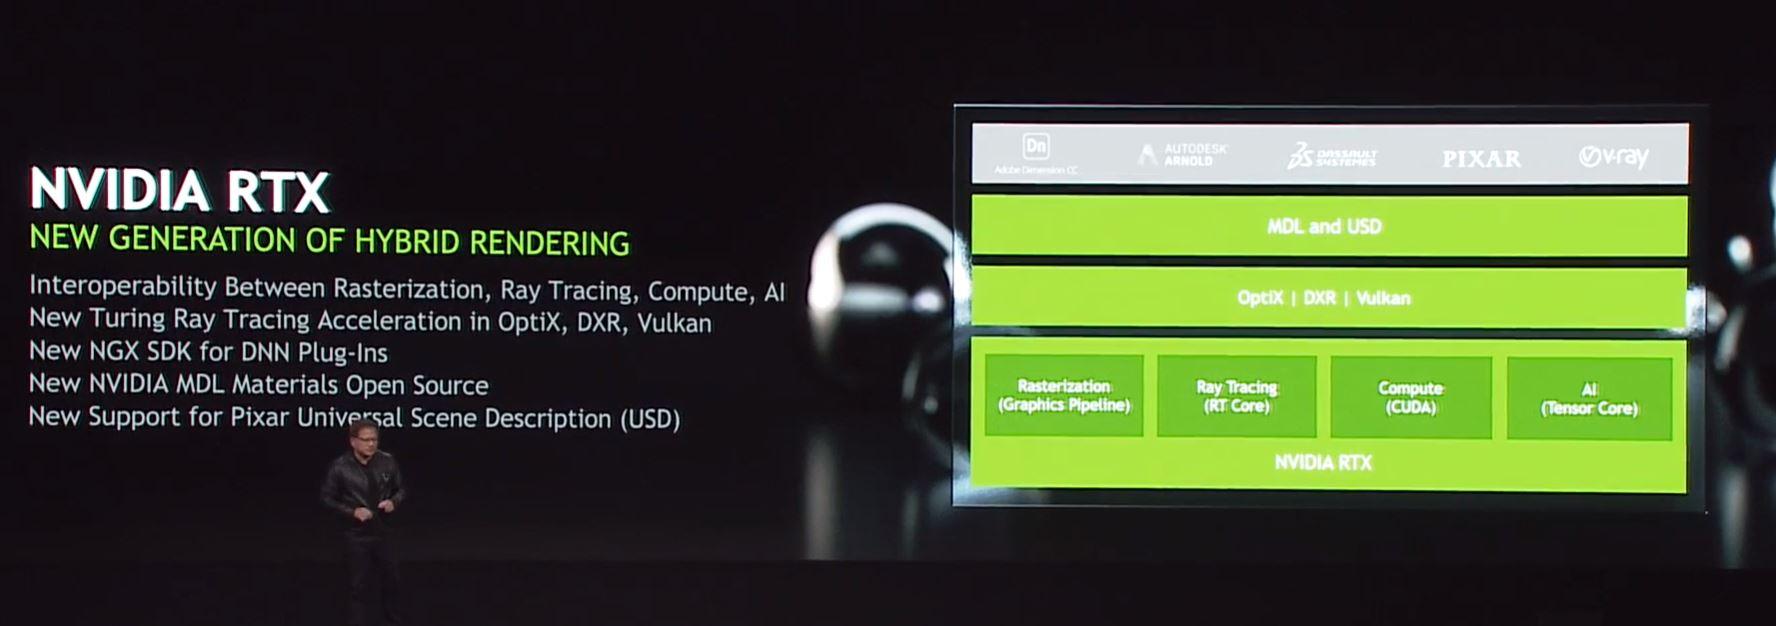 NVIDIA announces Quadro RTX 5000, 6000 and 8000 ray-tracing